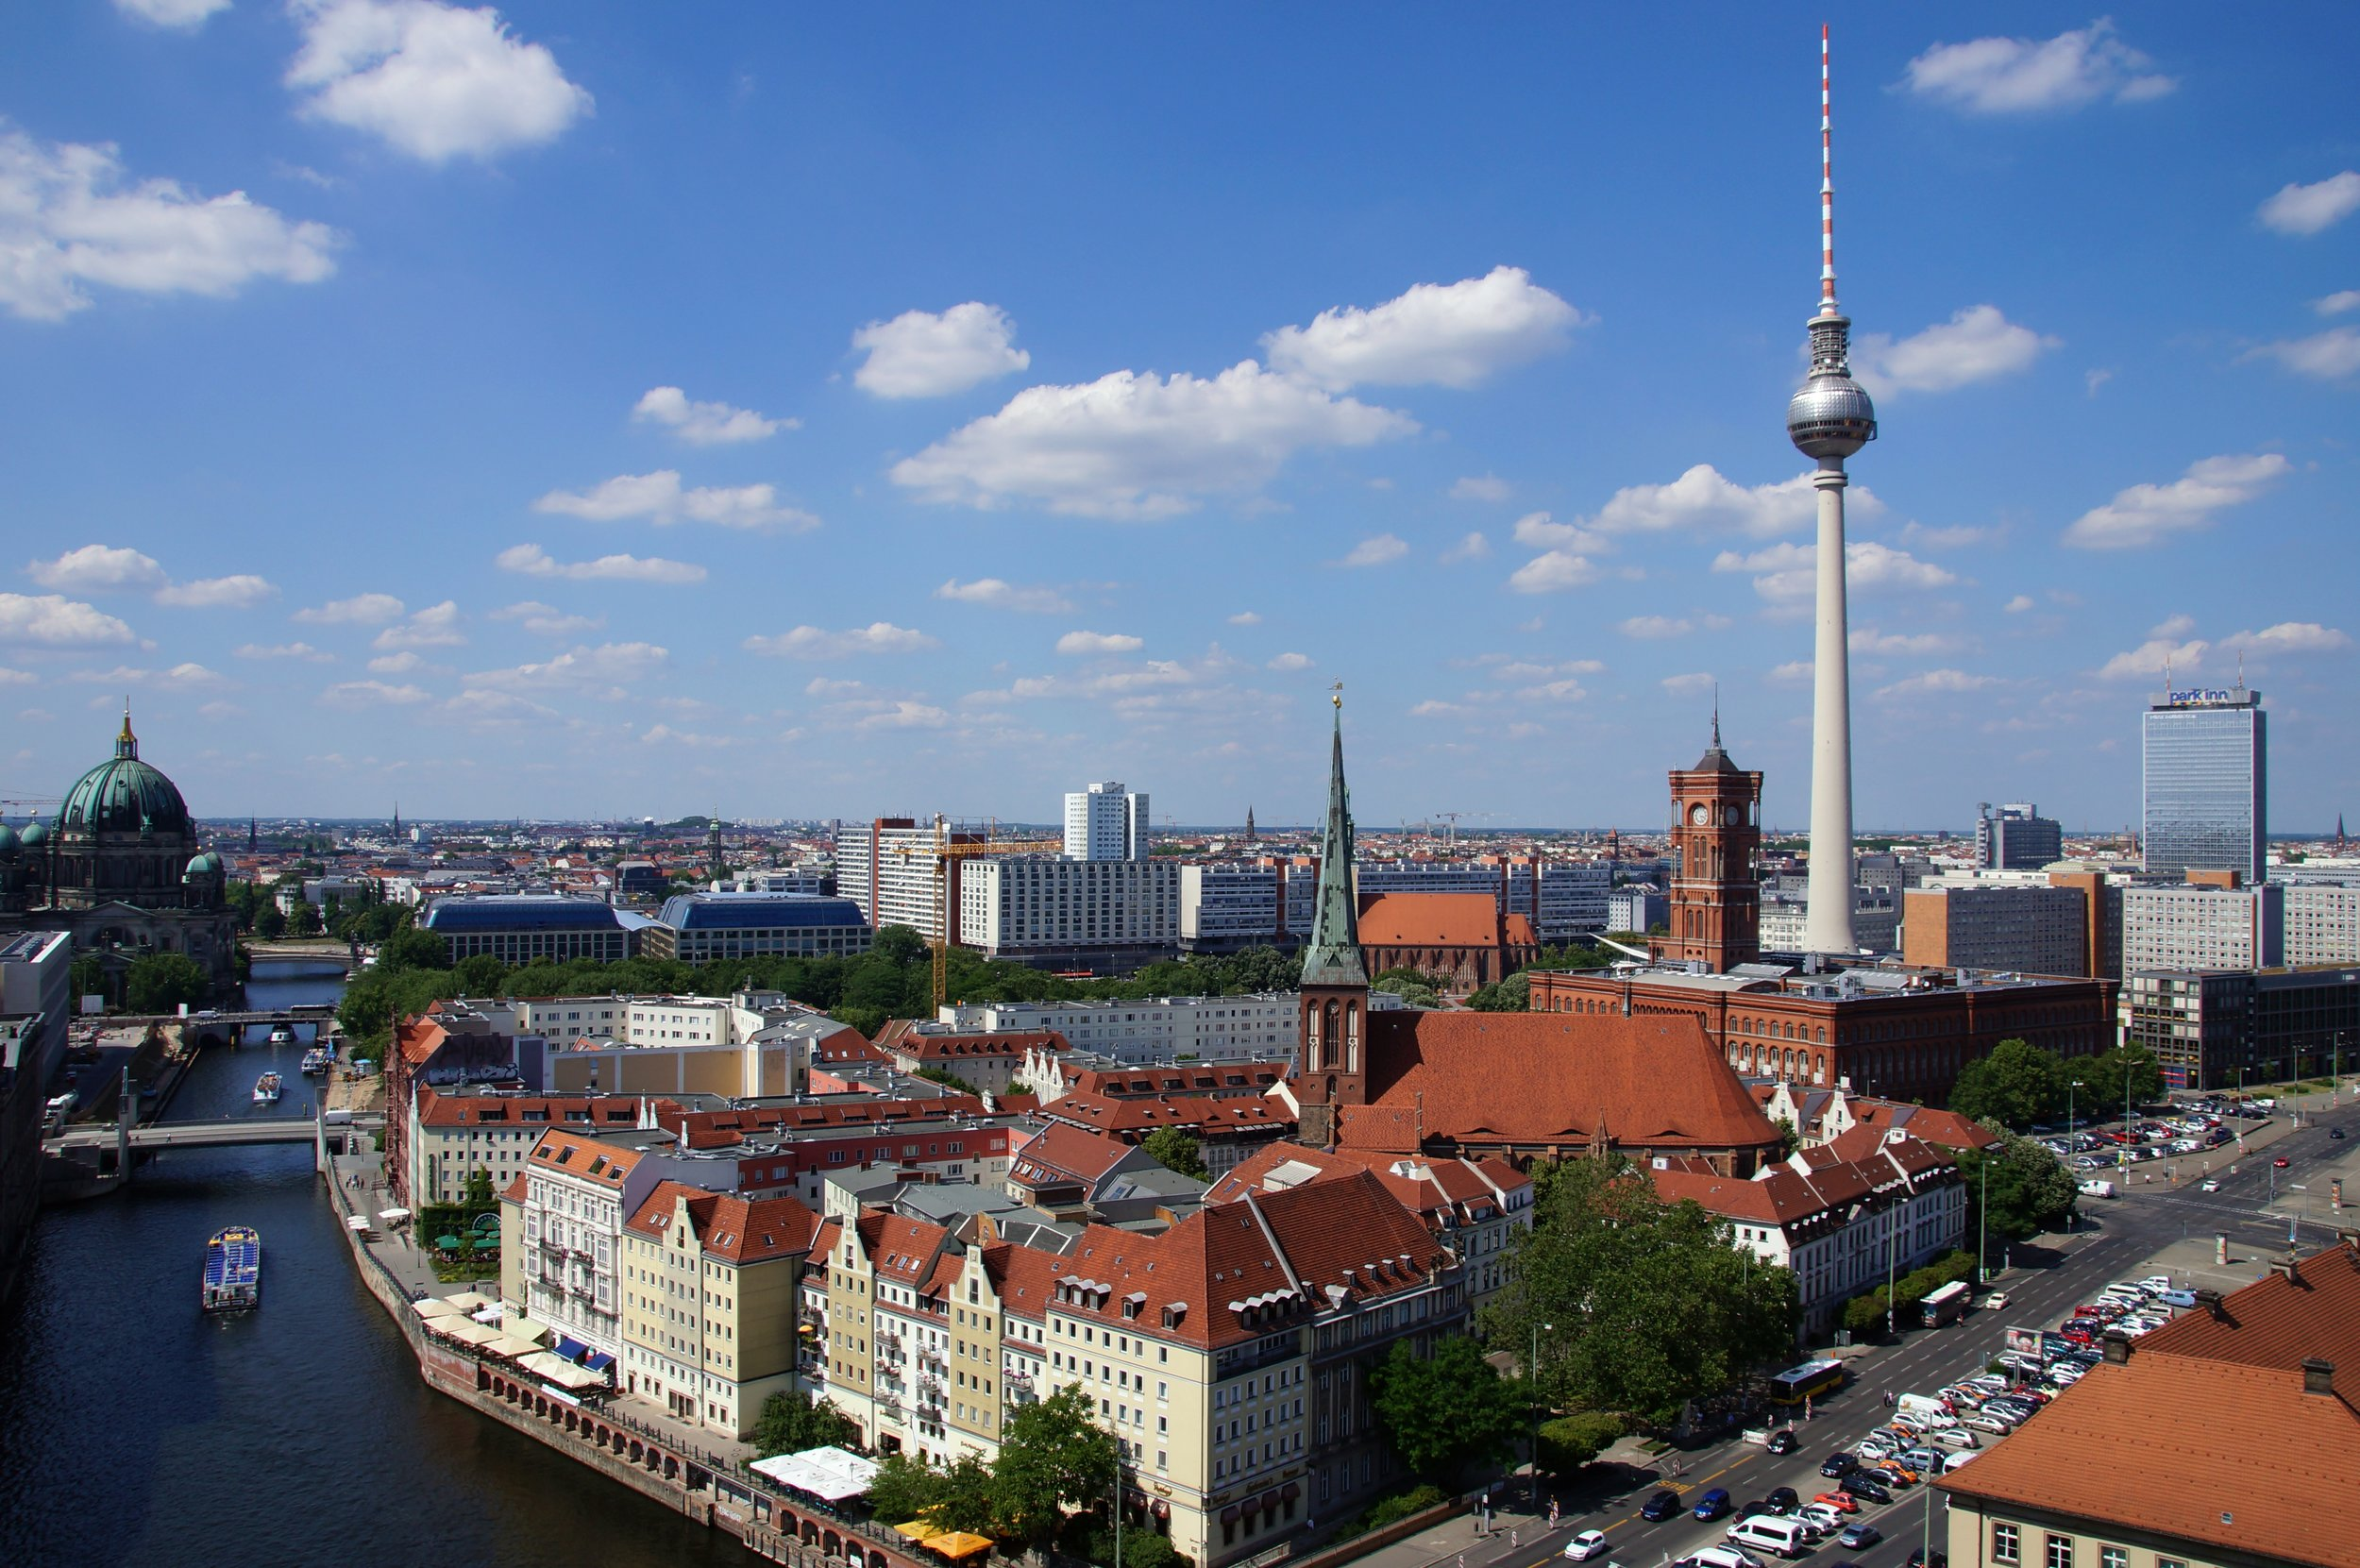 BerlinAlex.jpg